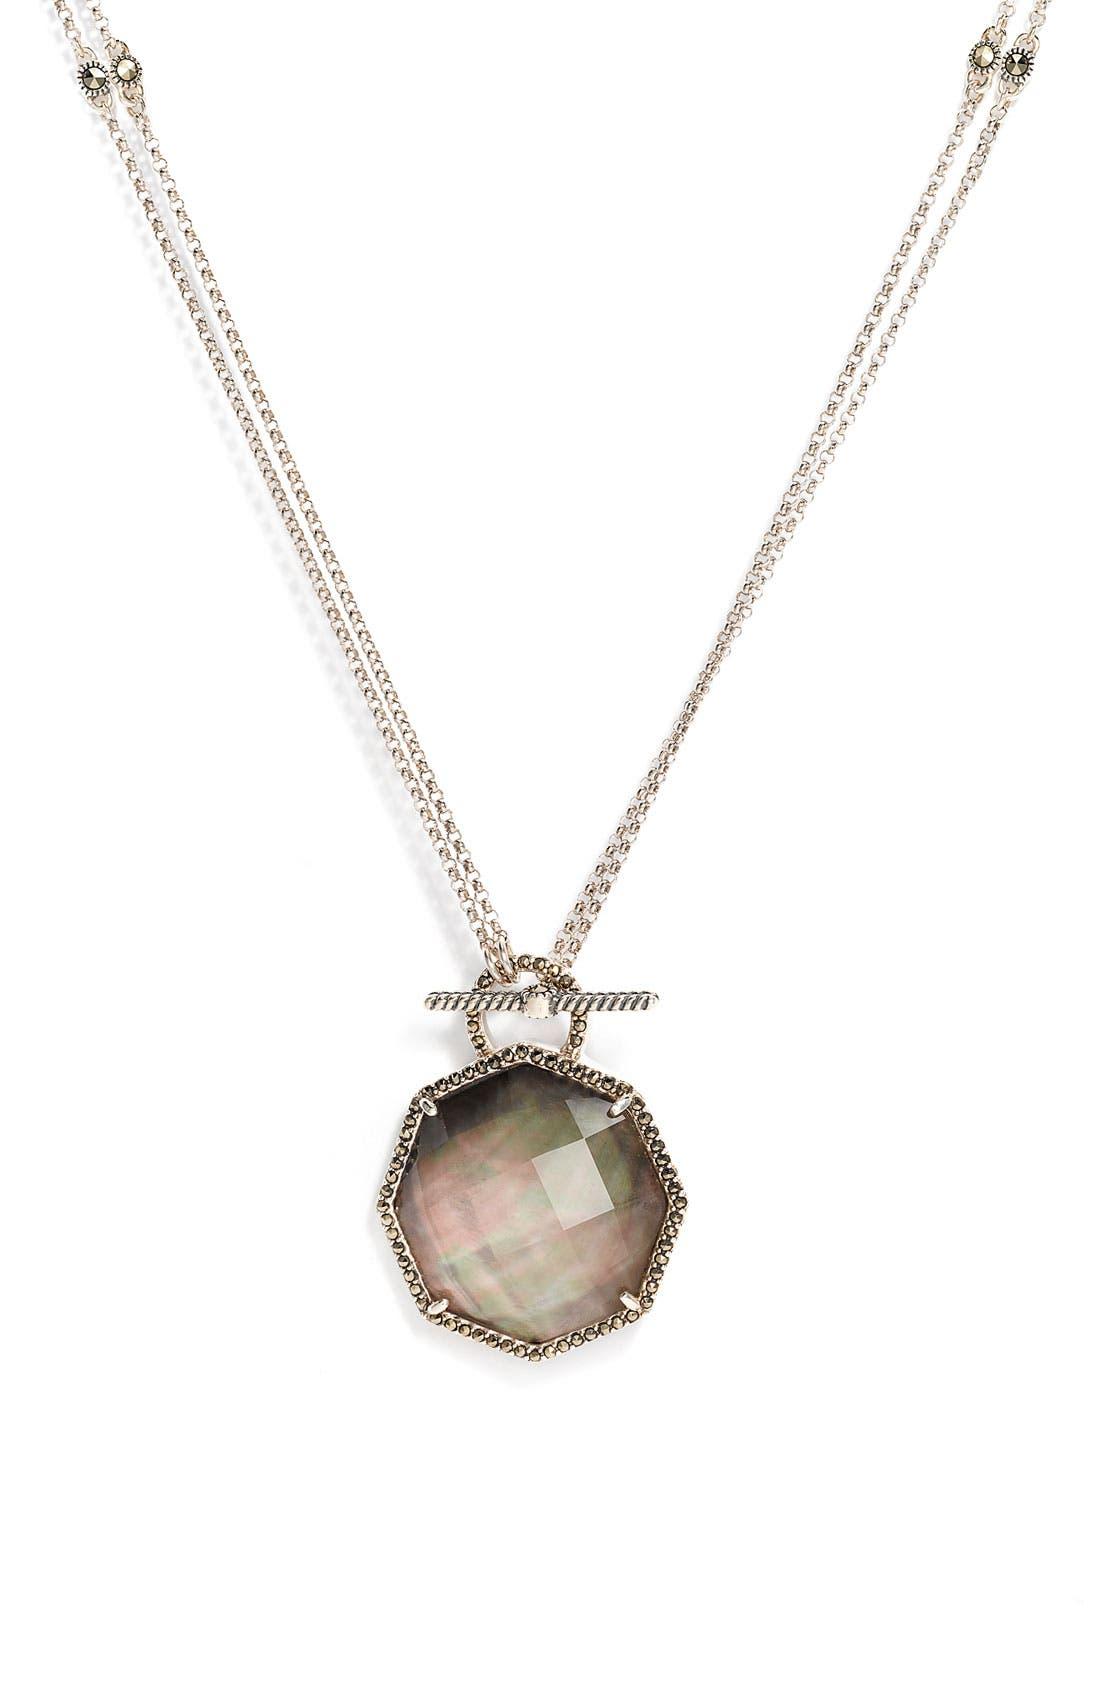 'Medallions' Semiprecious Convertible Necklace,                             Main thumbnail 1, color,                             001